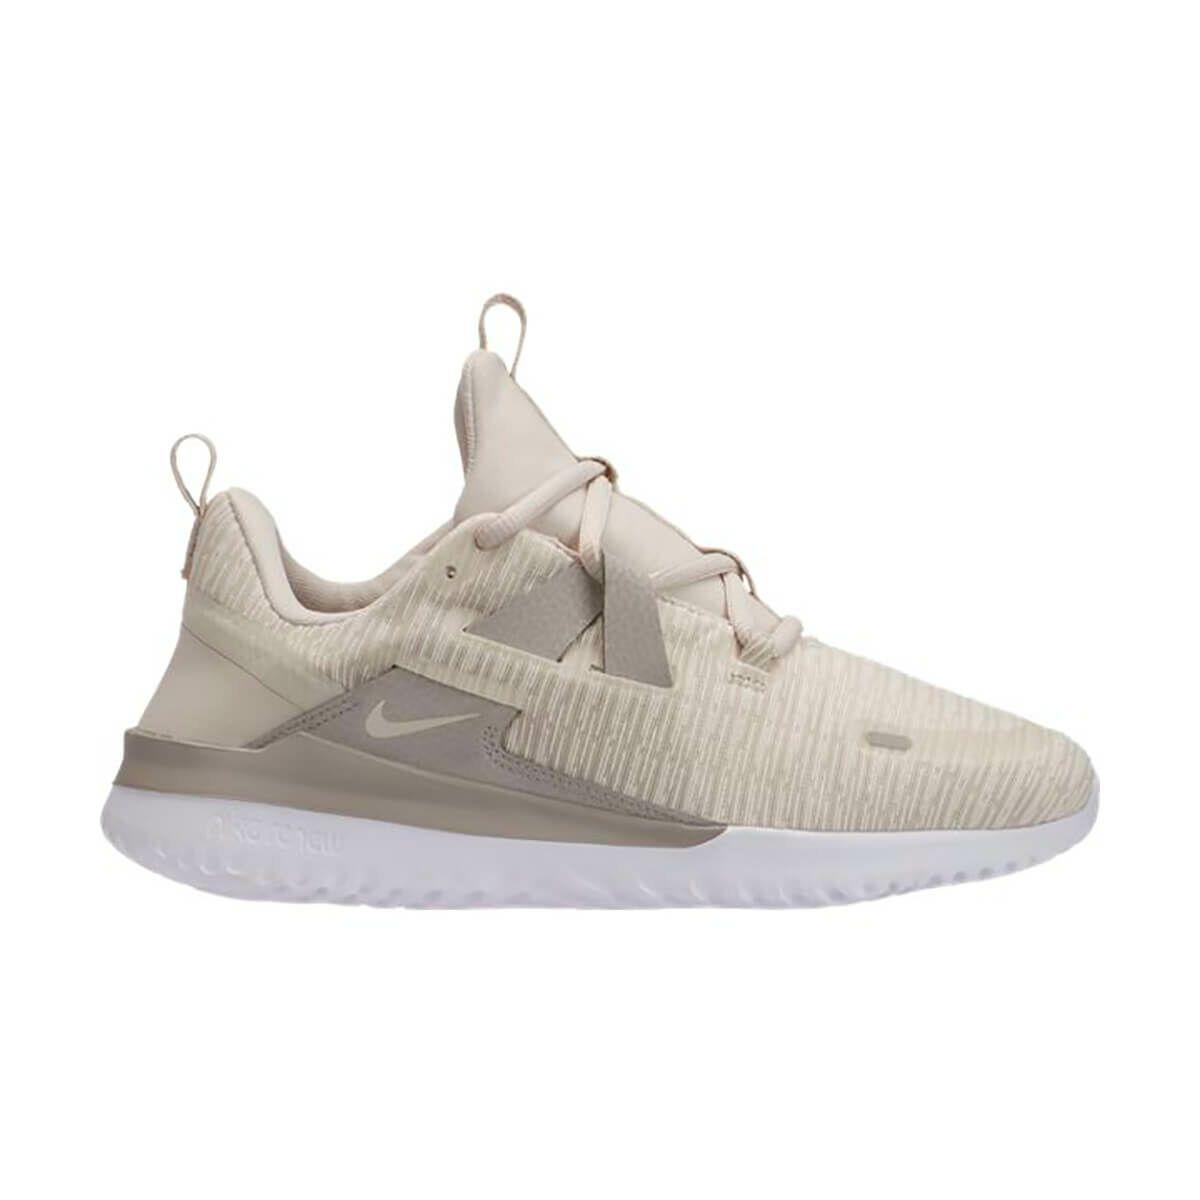 Nike Nike Wmns Renew Arena Bej Kadin Sneaker Ayakkabi Flo Ayakkabi Sneaker Bej Kadin